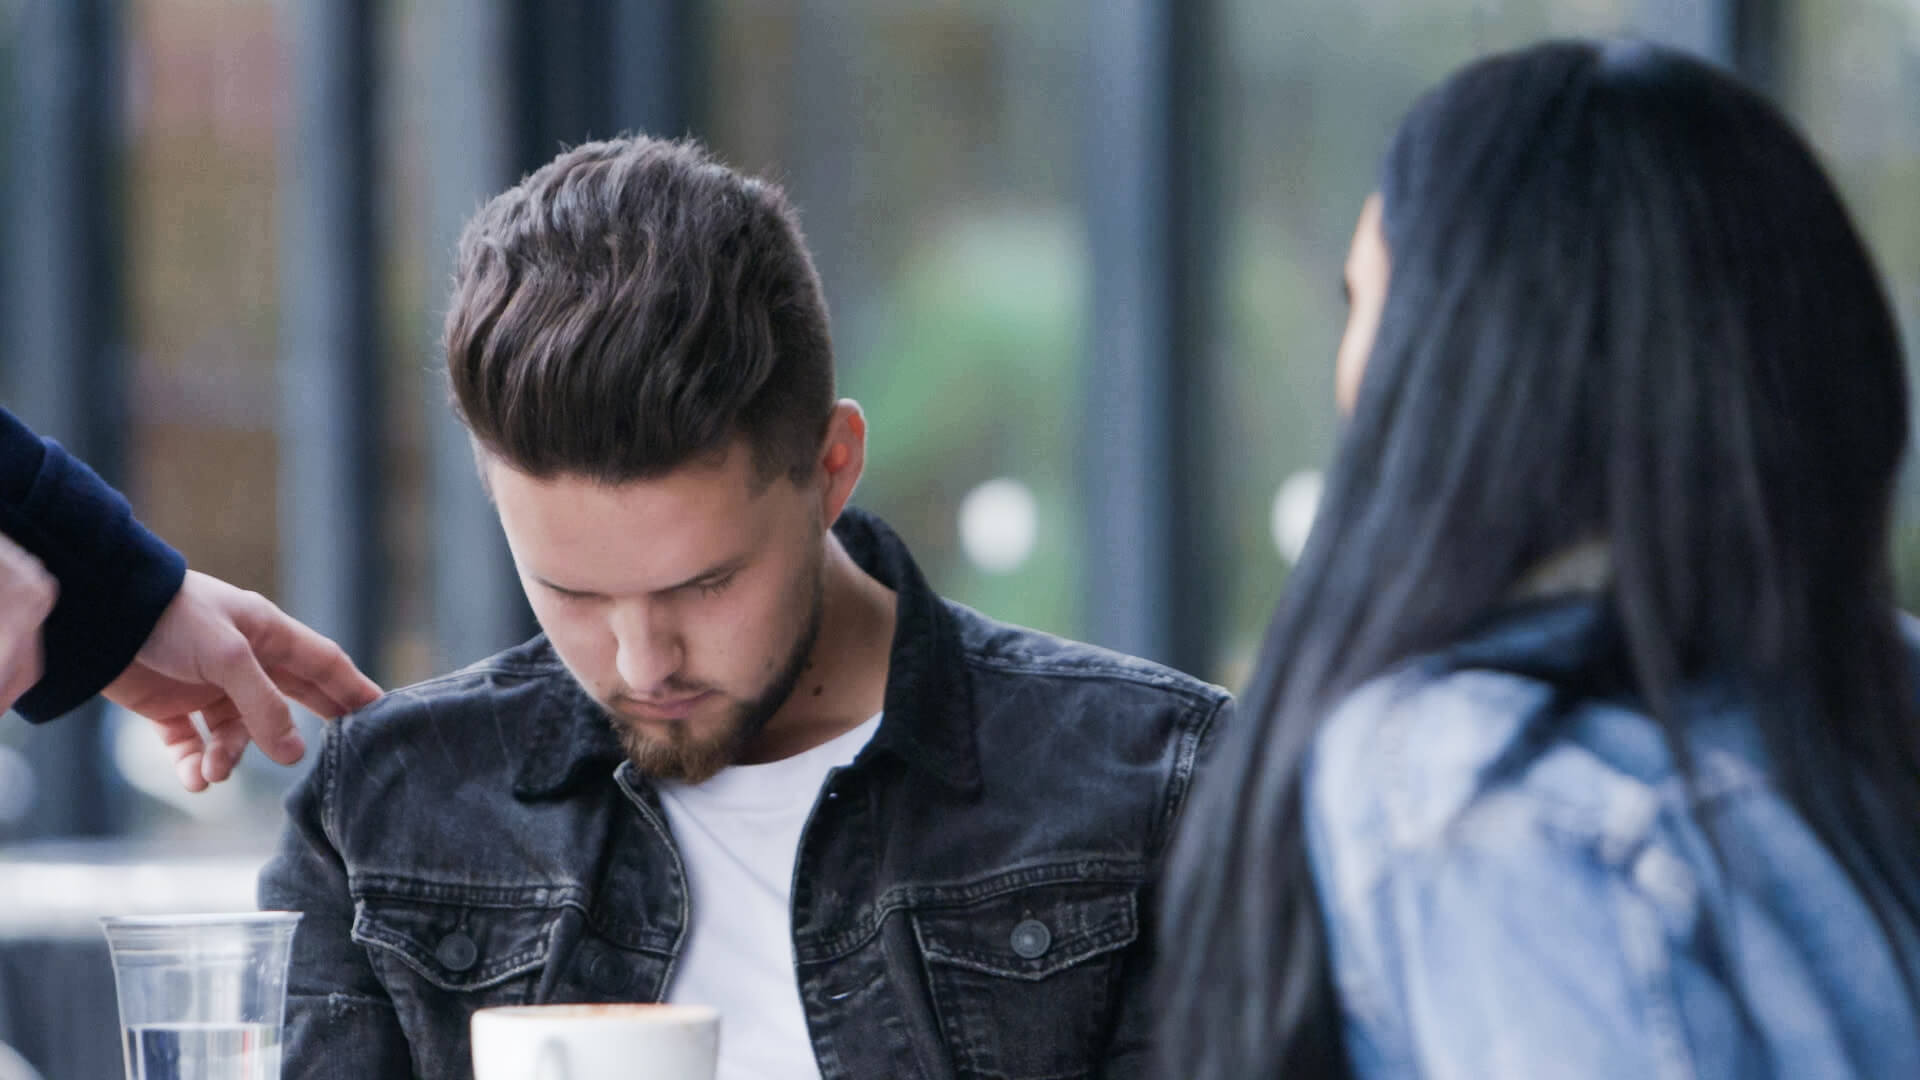 Aaron hypnotising man in new Channel 4 TV show Hello Stranger